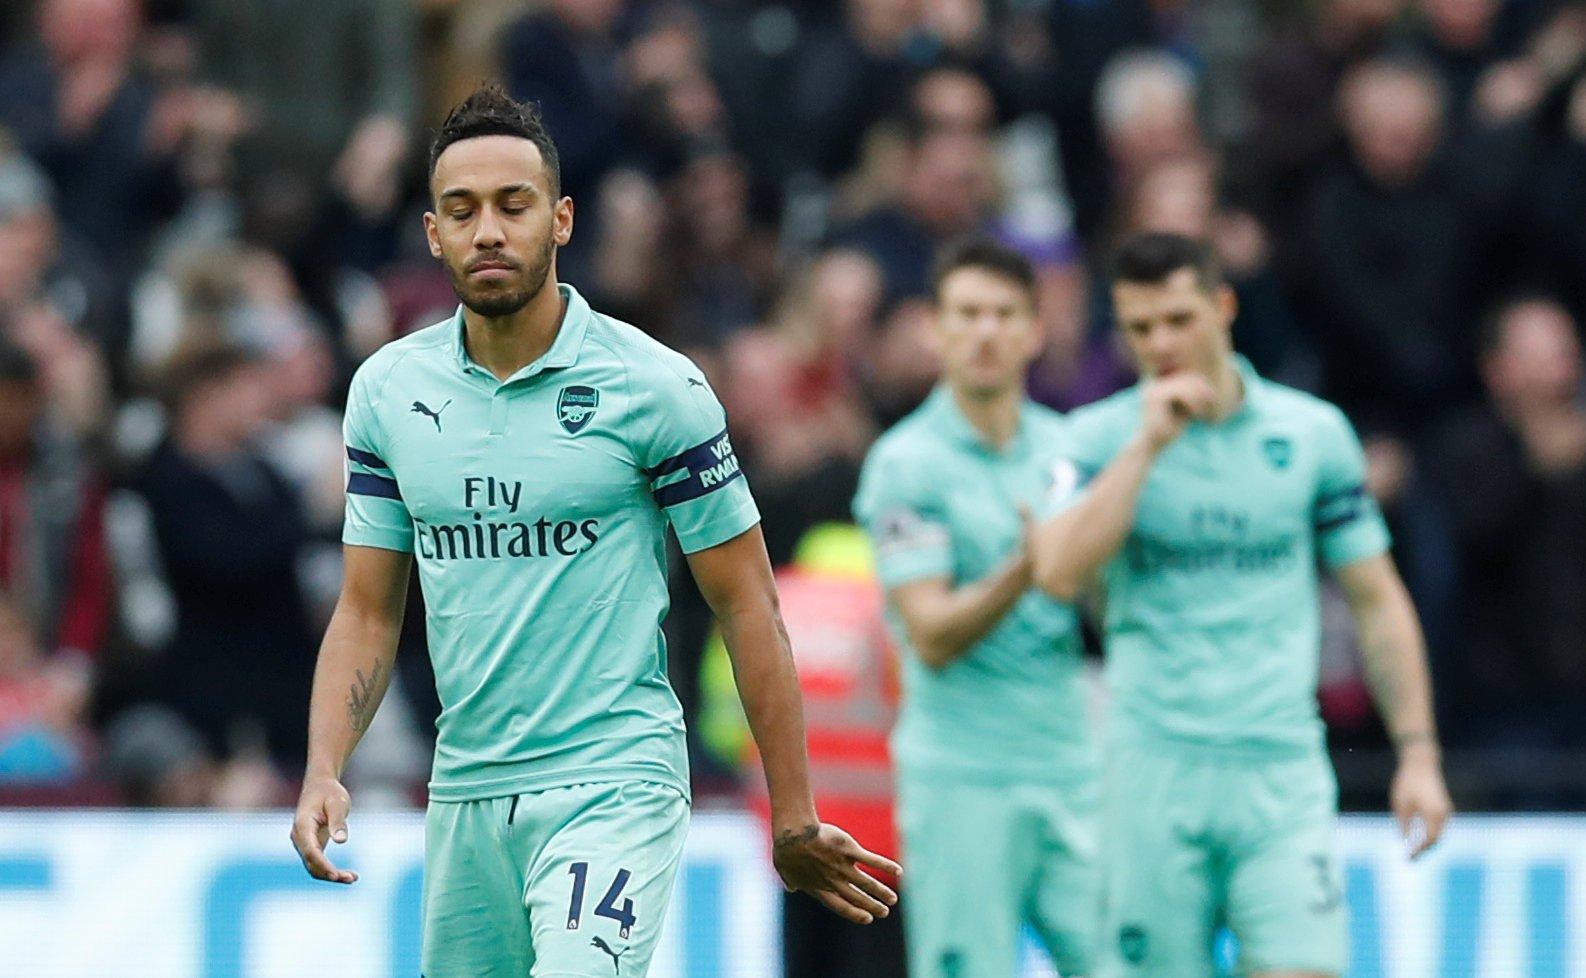 Arsenal fans hammer Granit Xhaka for schoolboy error against West Ham